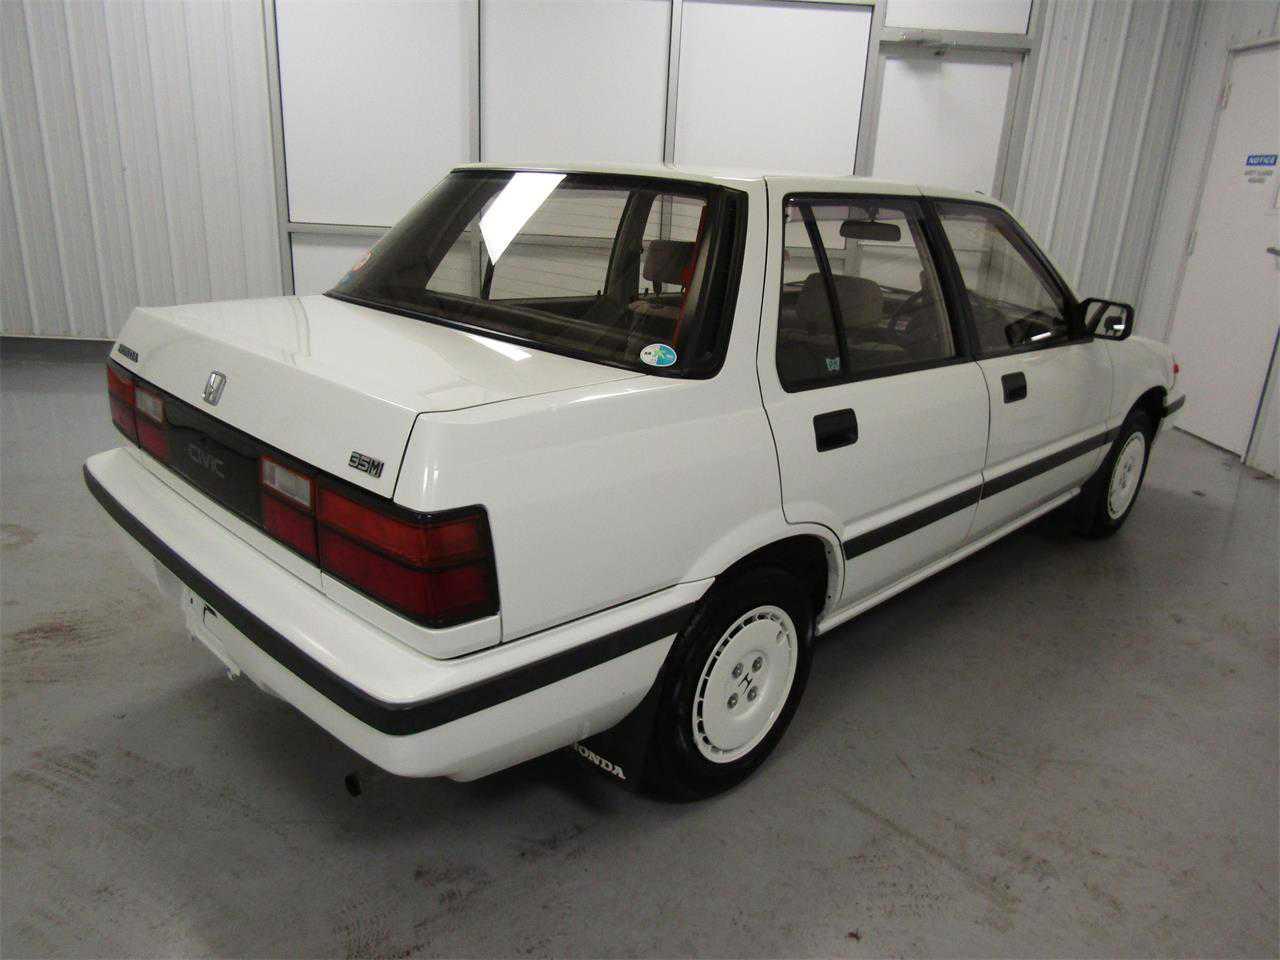 1987 Honda Civic for sale in Christiansburg, VA   00000000AK1306009